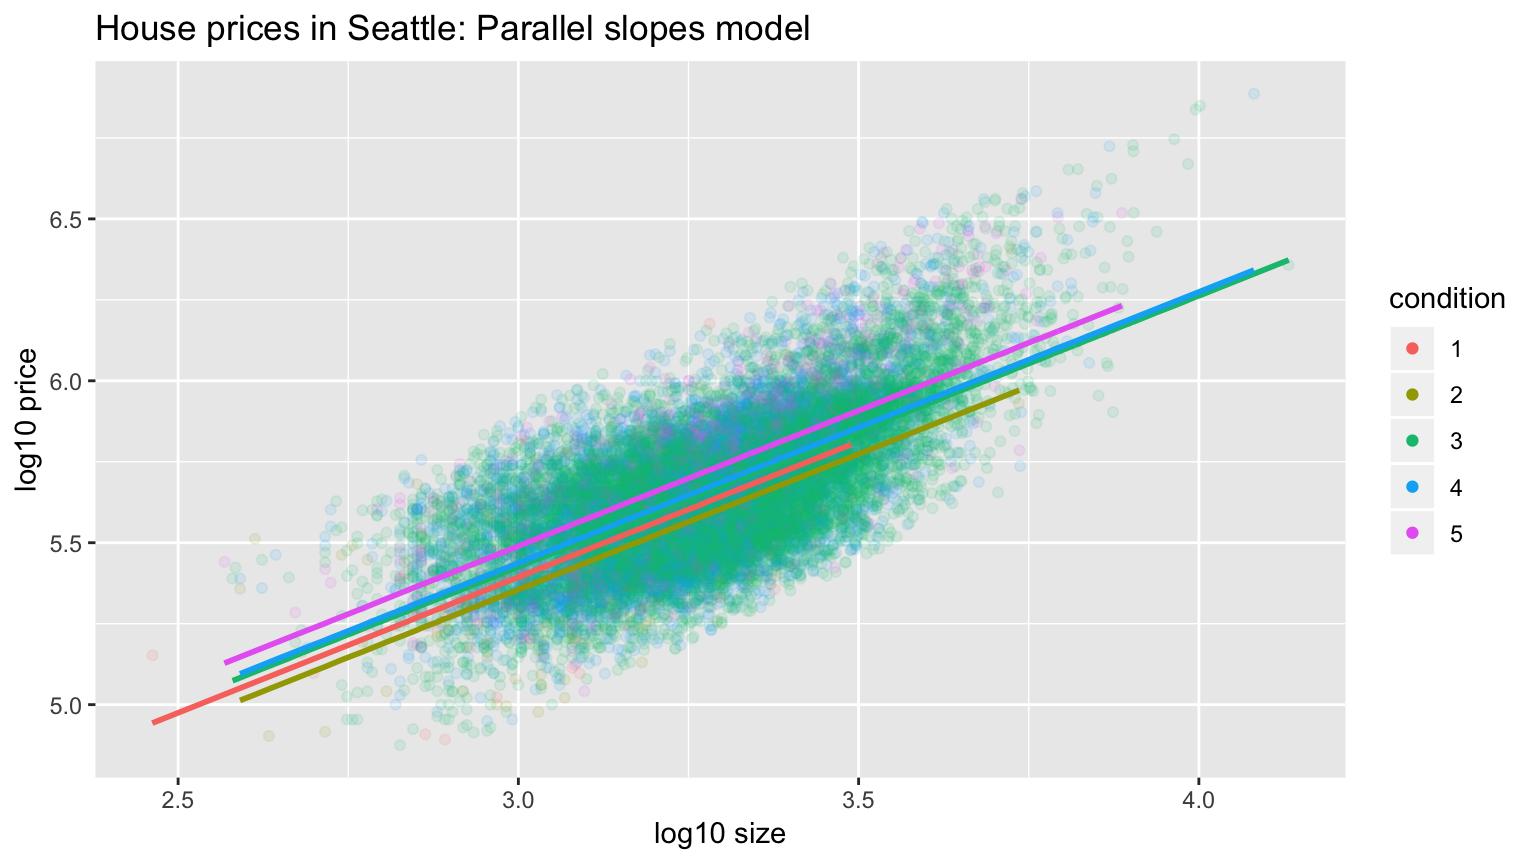 Parallel slopes model